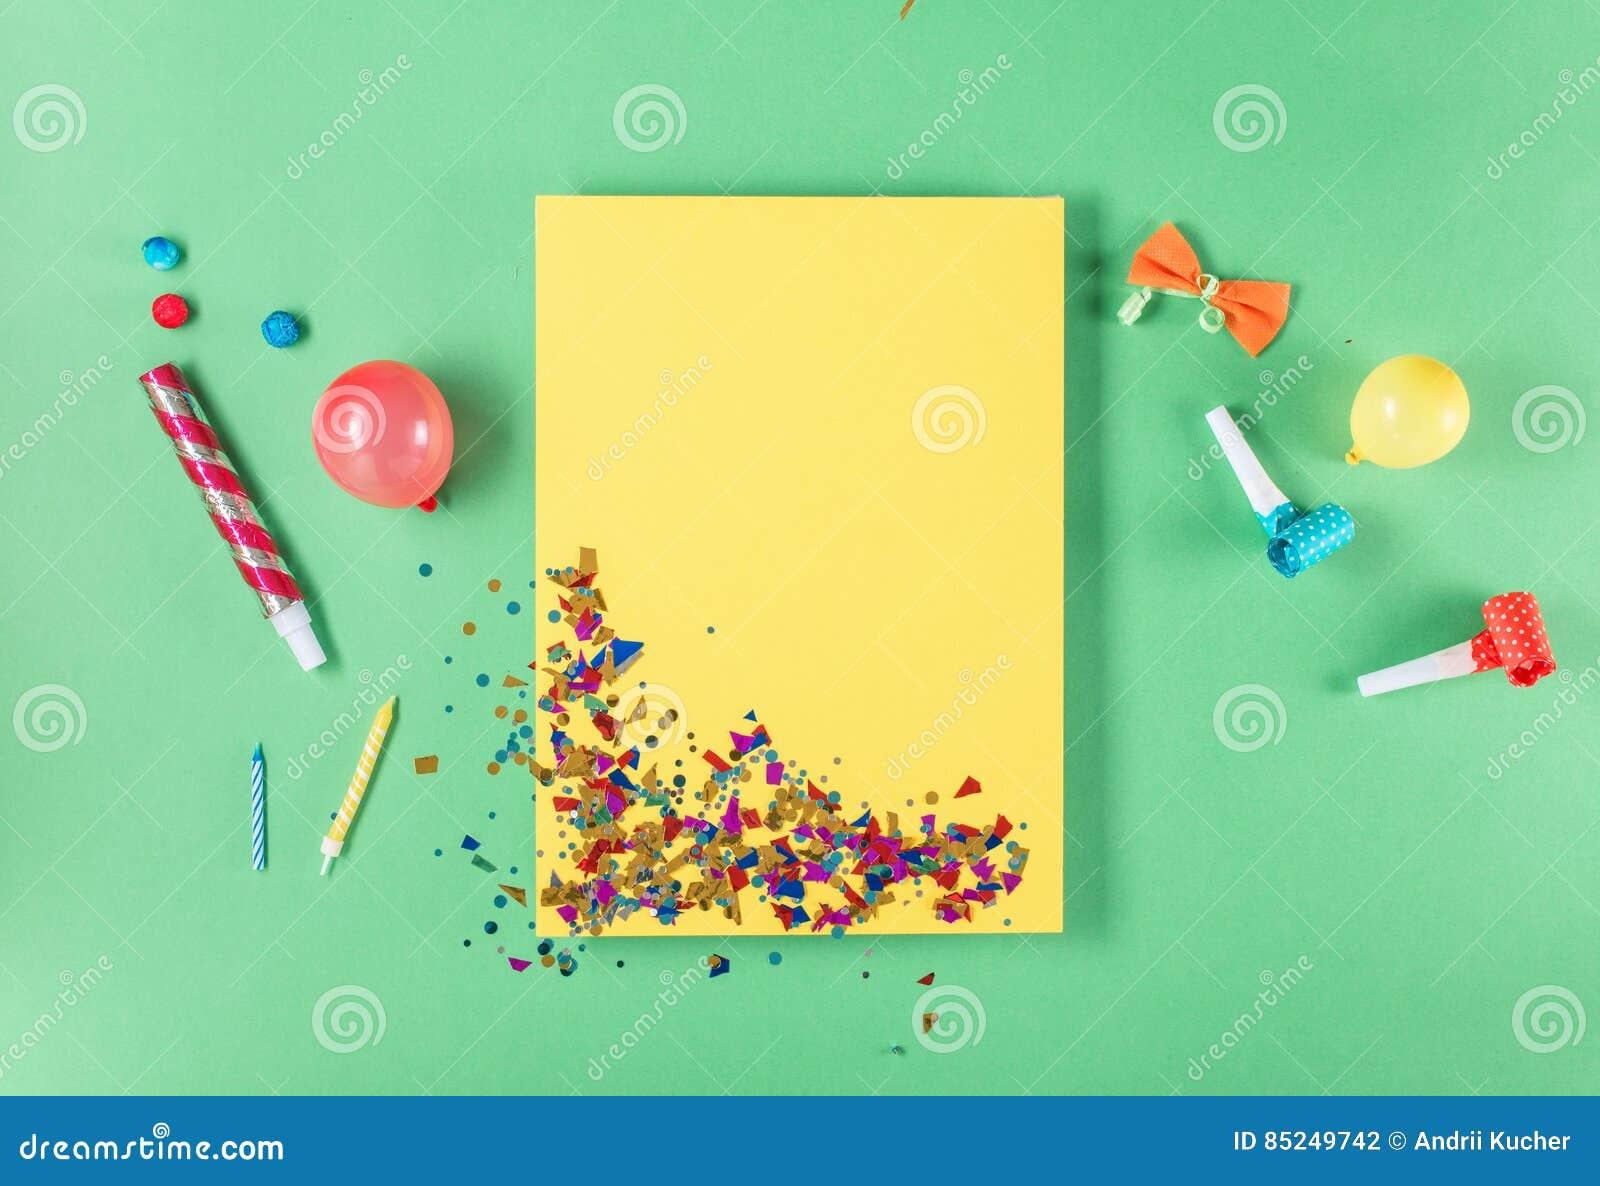 Lege gele kaart met diverse partijconfettien, ballons, noisema